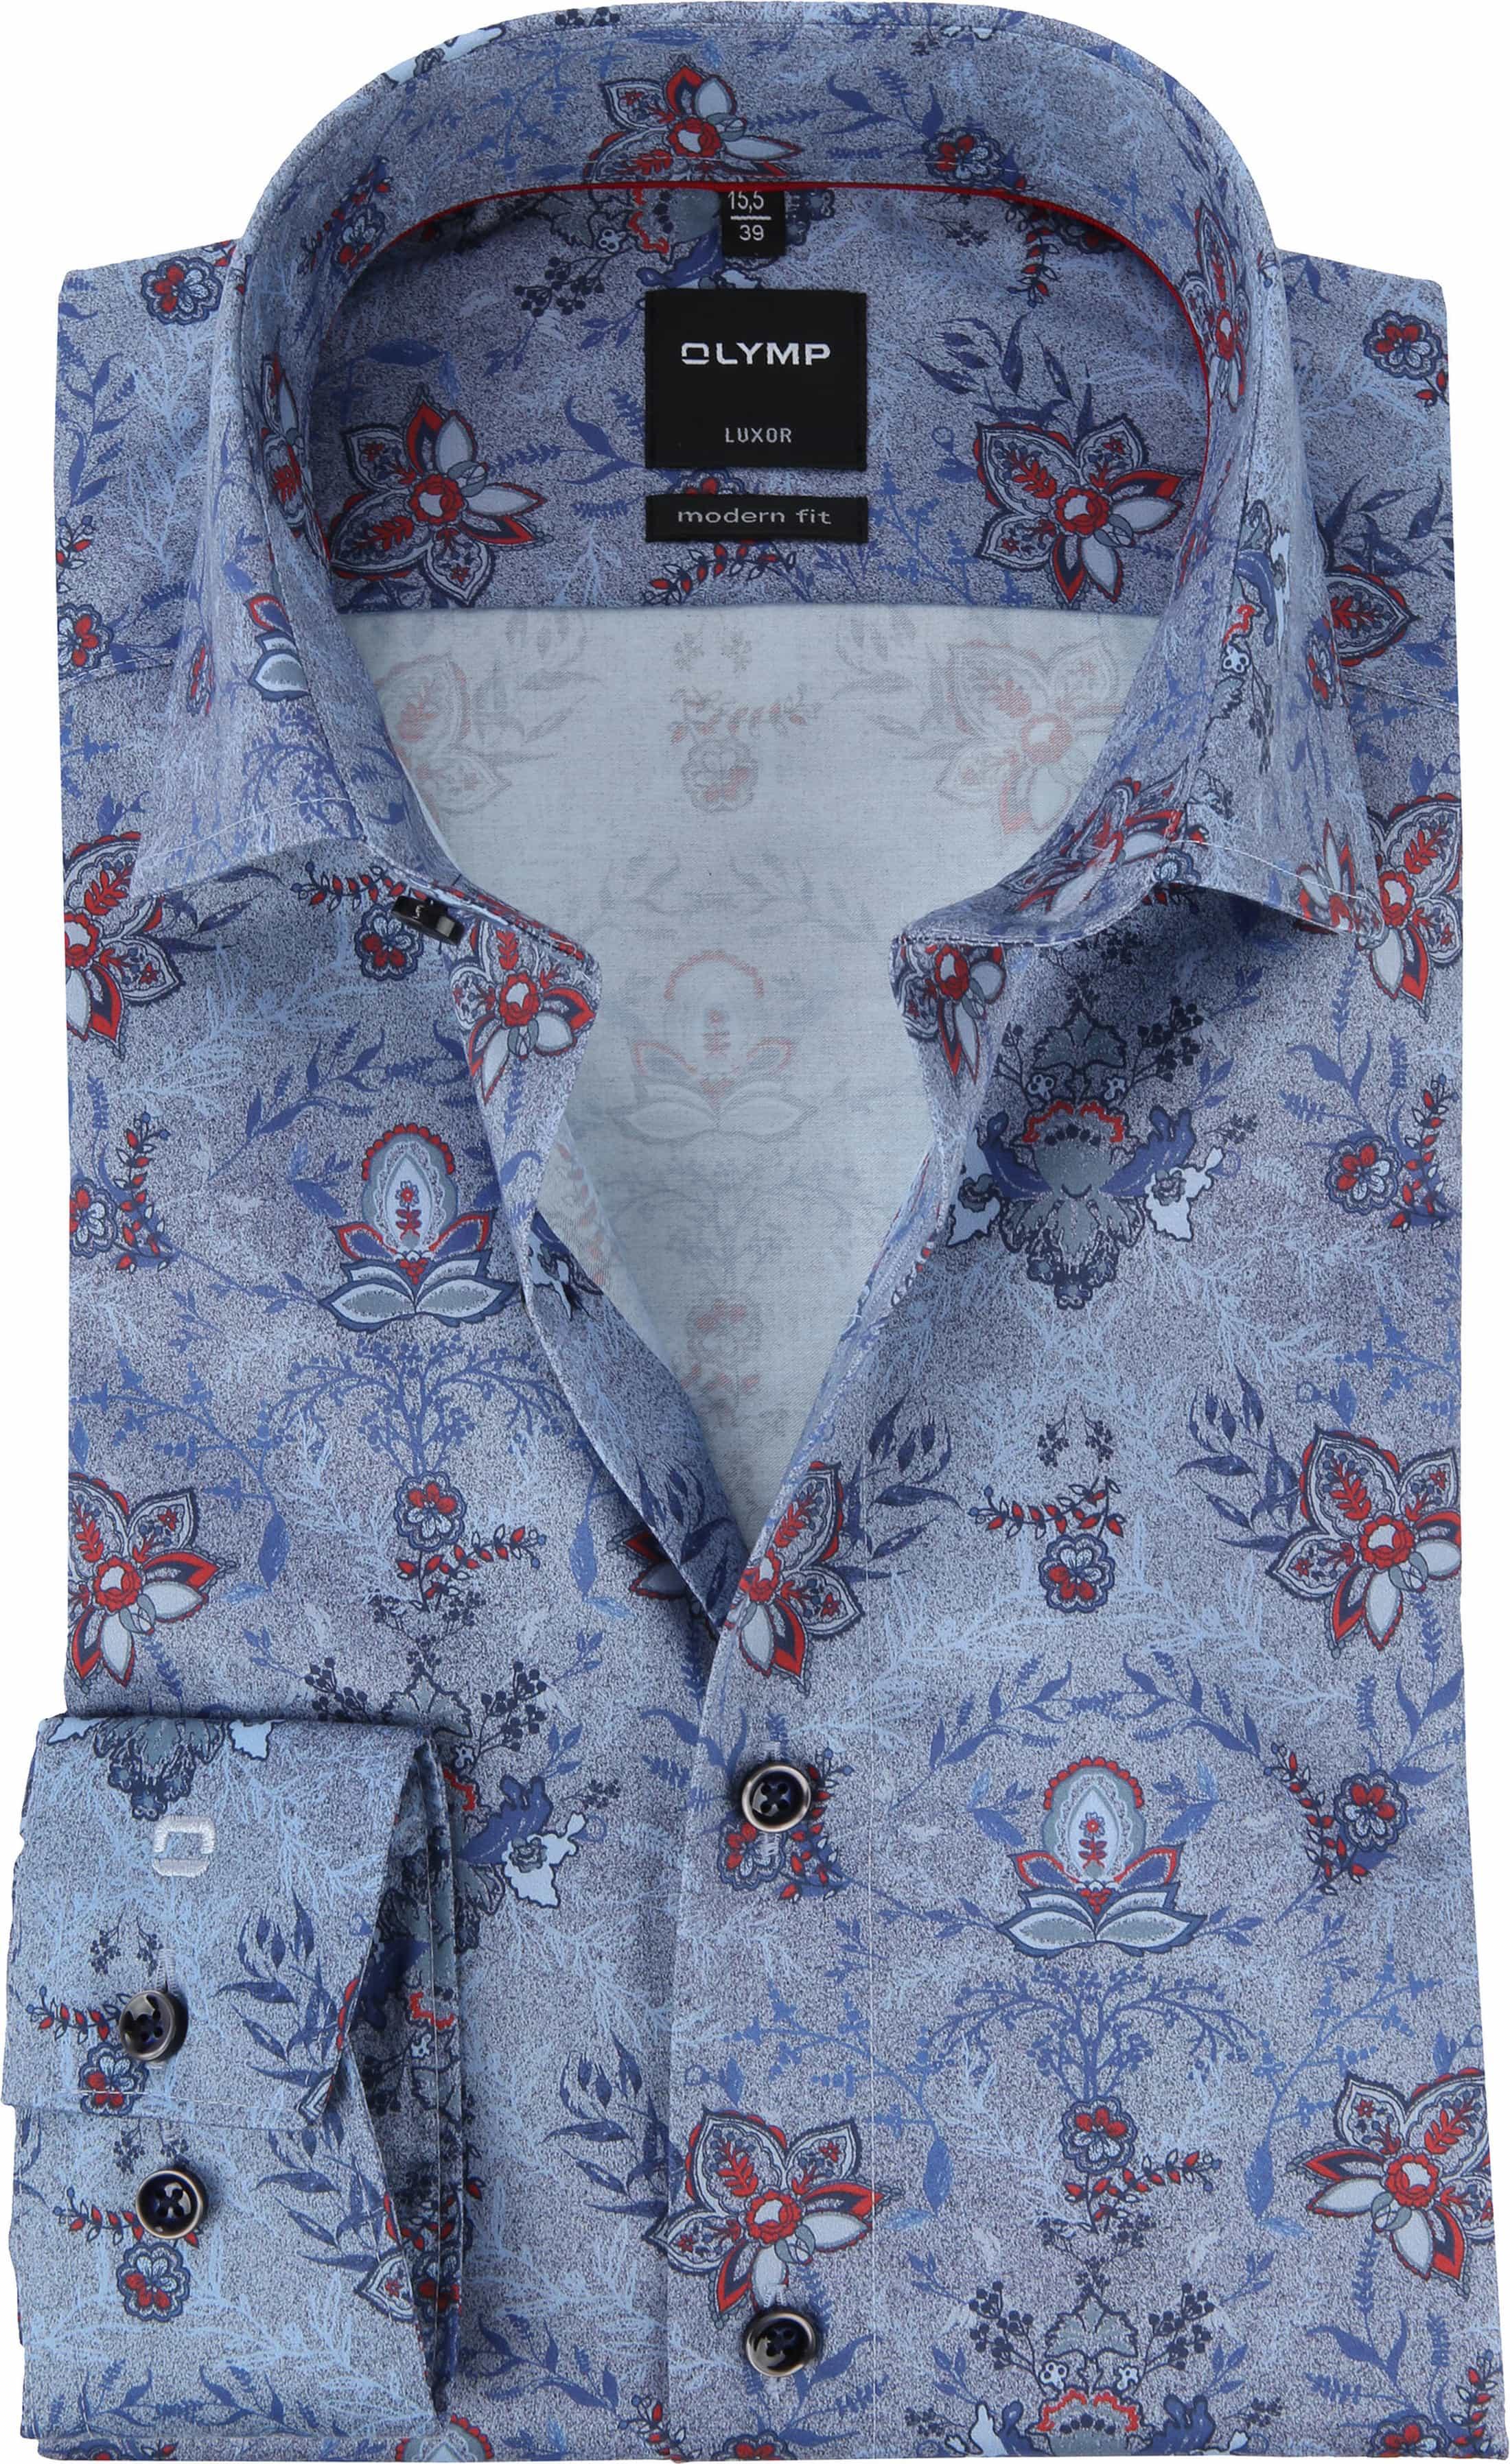 competitive price 41820 cf2f2 OLYMP Luxor MF Hemd Blumen Blau 120434 online kaufen | Suitable